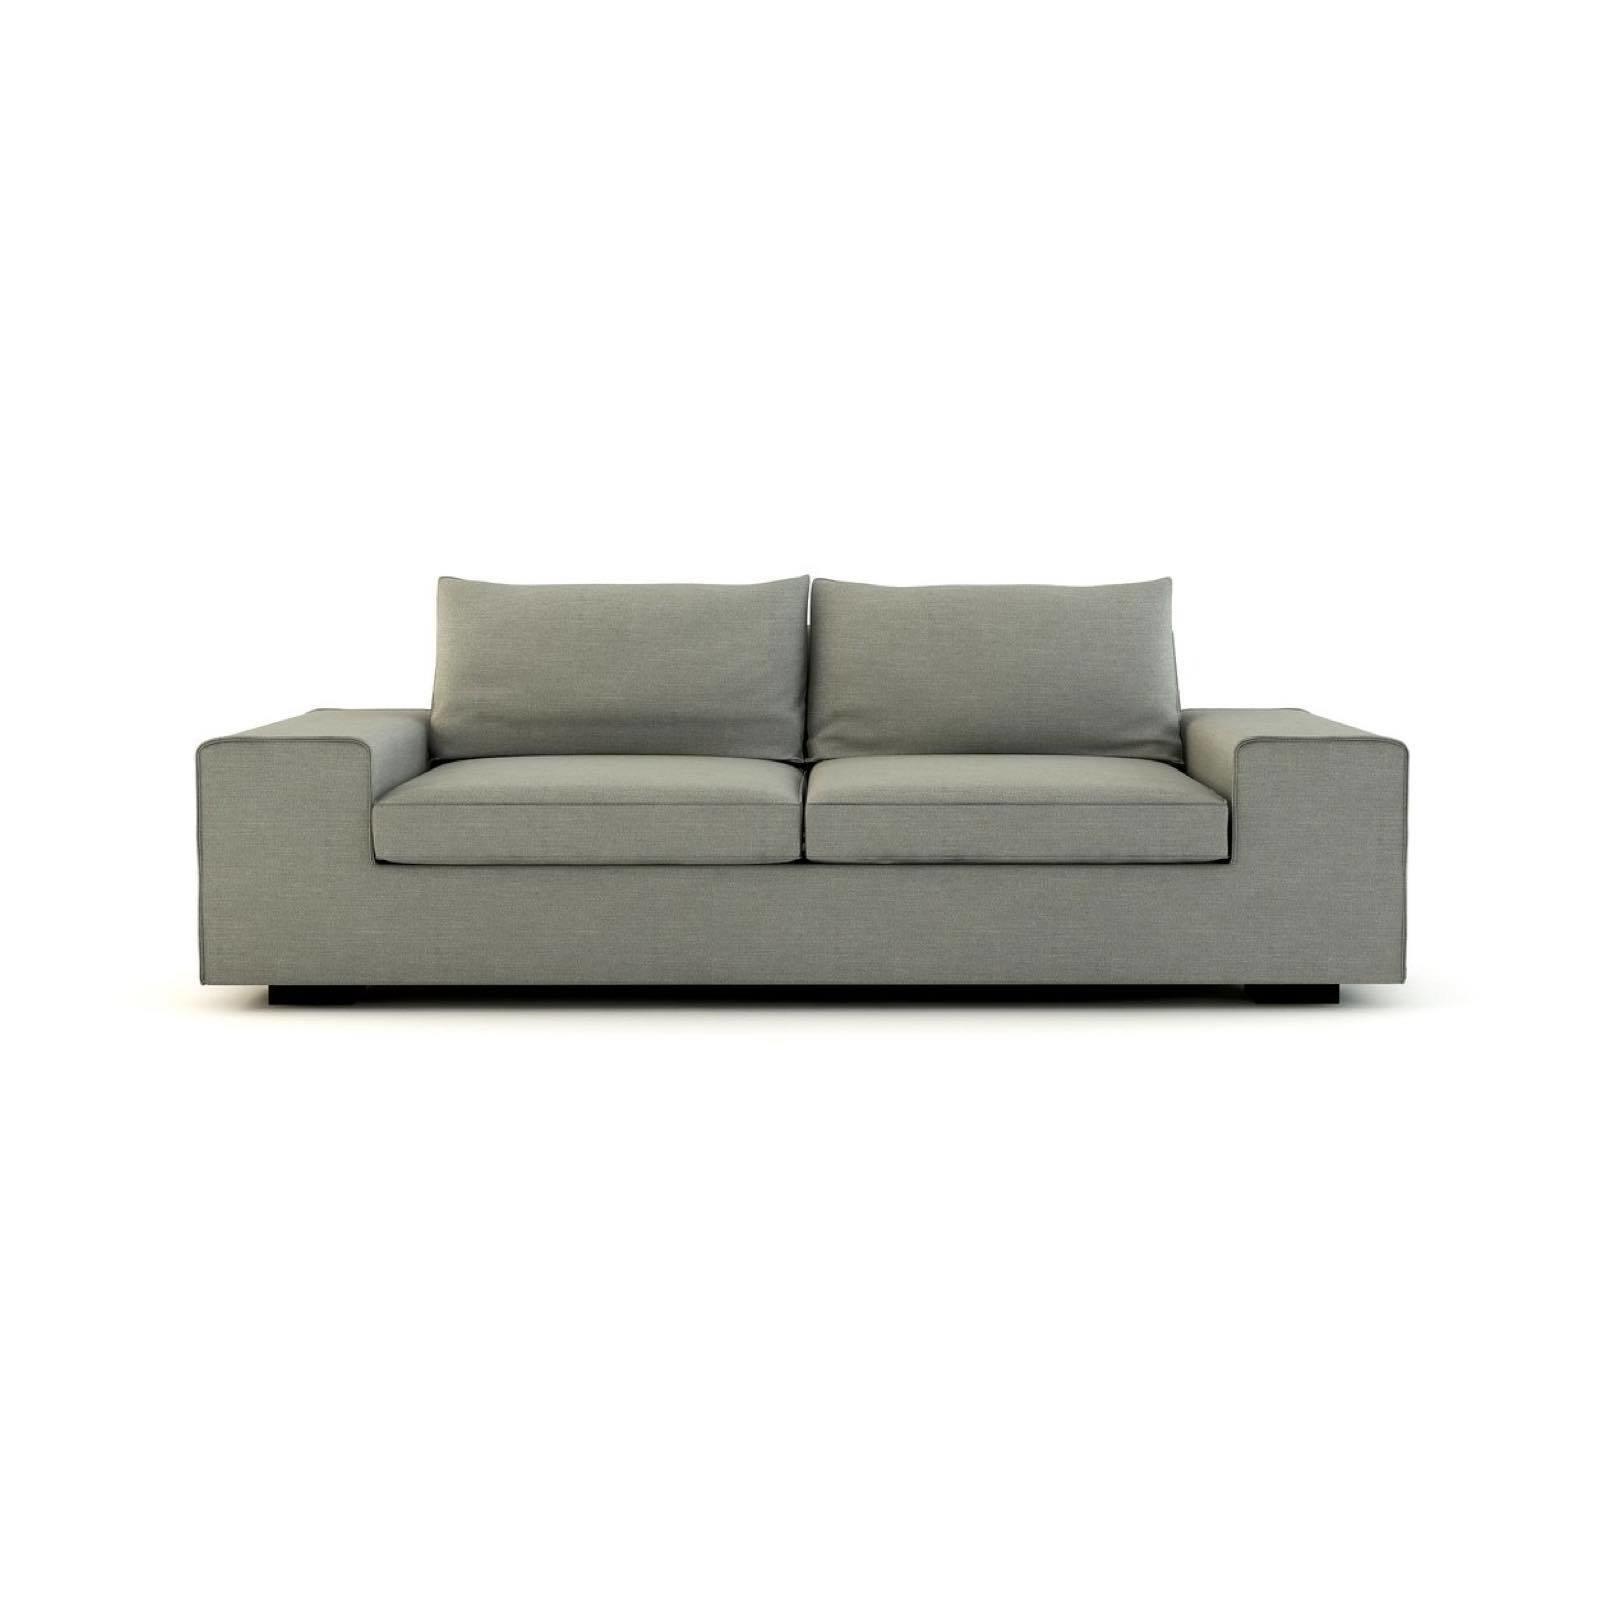 Shop Modern Furniture Living Room Sleeper Sofas Dwell